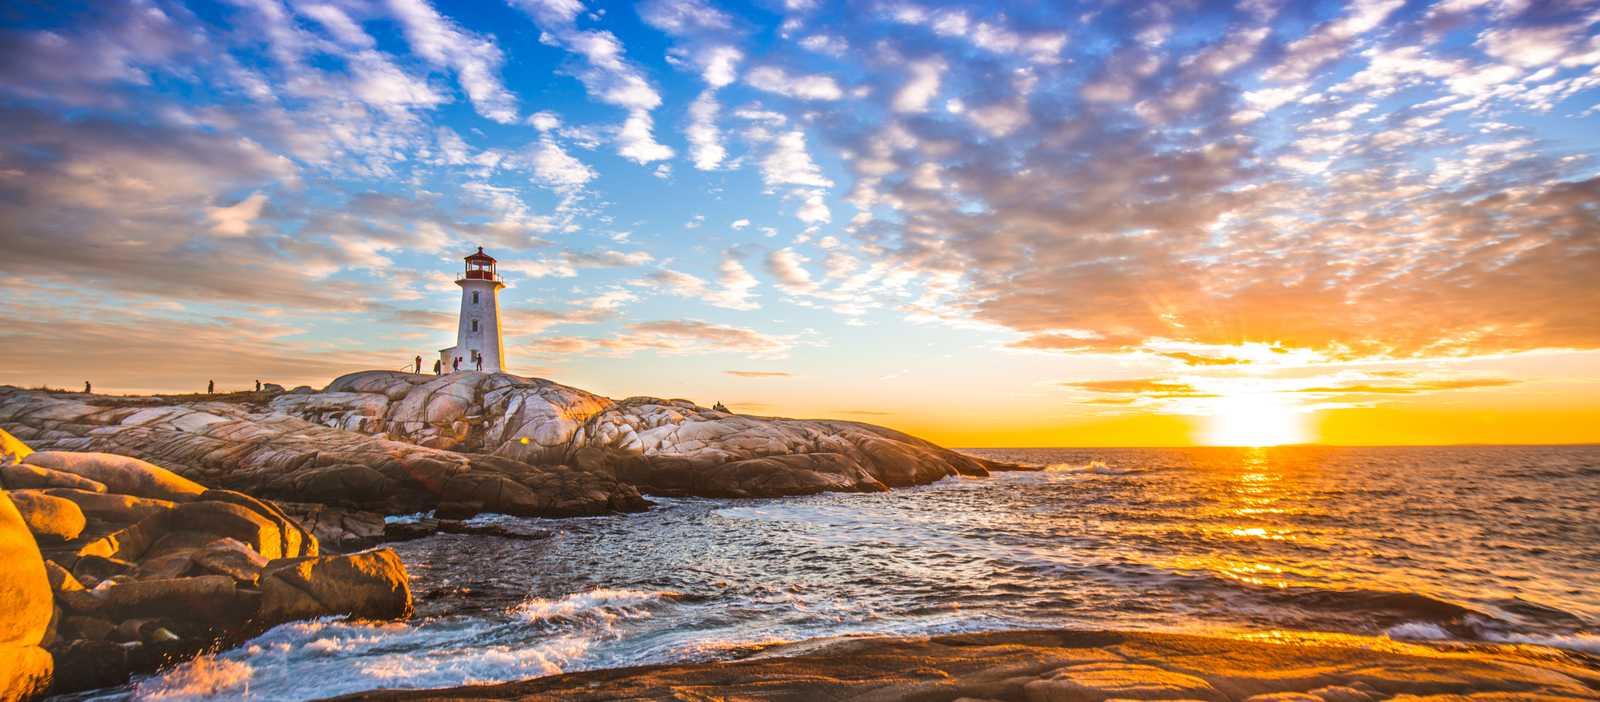 Der berühmte Leuchtturm von Peggy's Cove an der St. Margarets Bay bei Sonnenuntergang in Nova Scotia